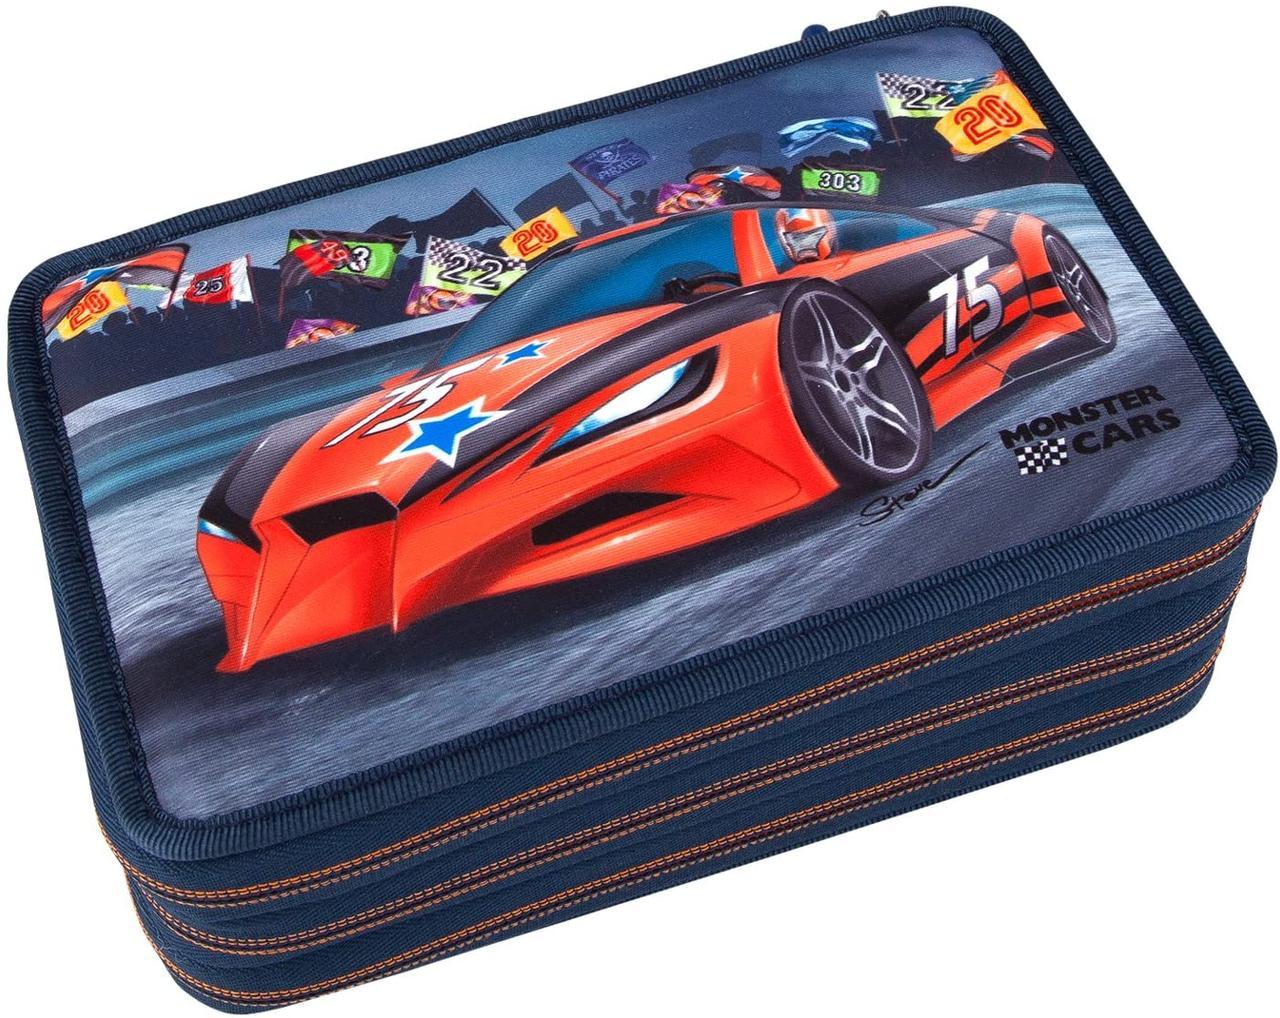 Monster Cars пенал з наповненням від TOP Model  ( Пенал с наполнением от ТОП Модел для мальчика 8218_A)